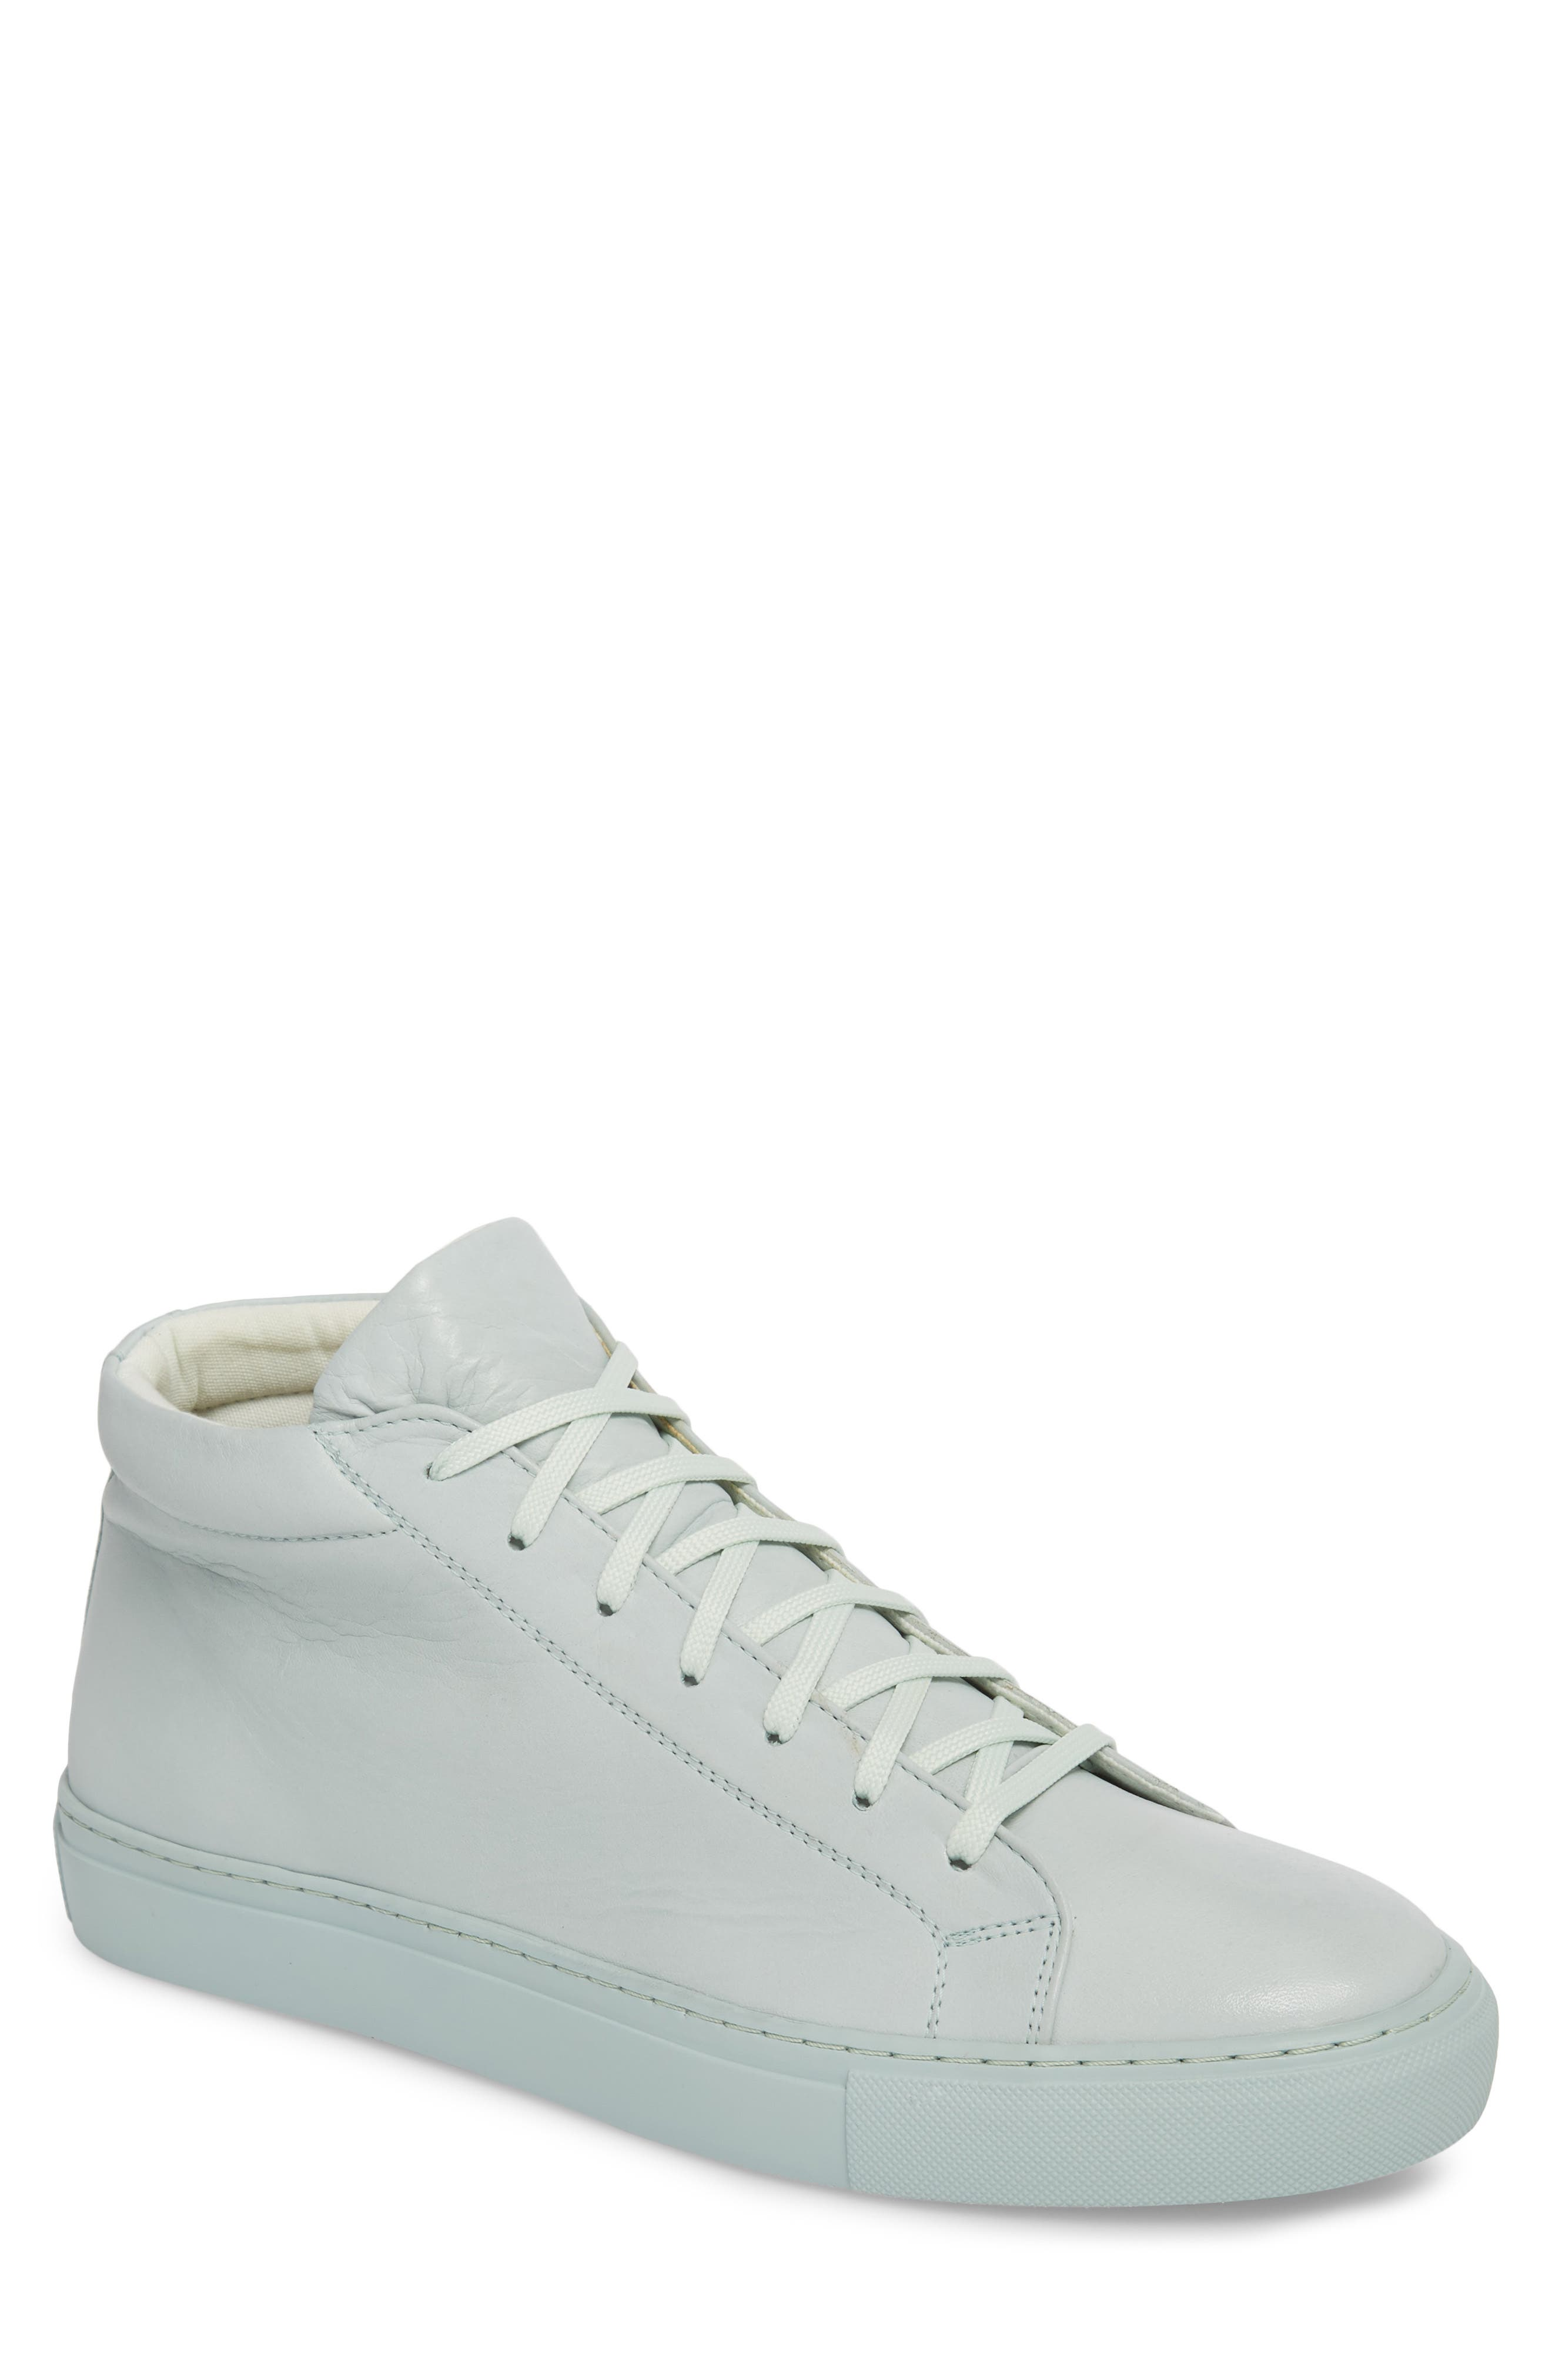 Lexington Mid Top Sneaker,                         Main,                         color, Mint Green Leather